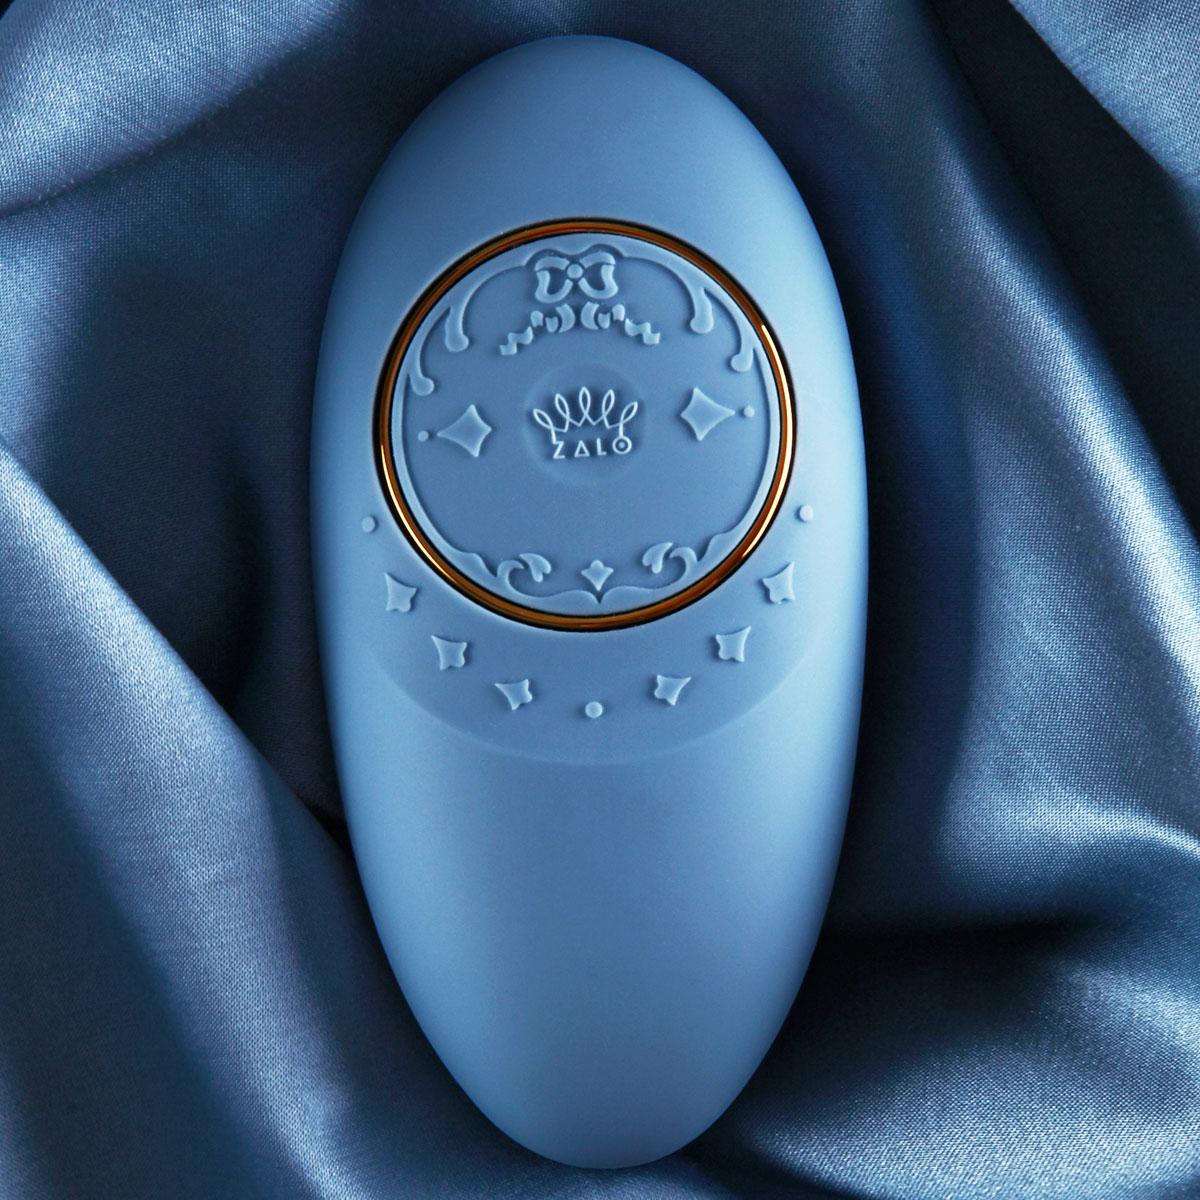 ZALO Jeanne Personal Silicone Waterproof Vibrator - Glamour